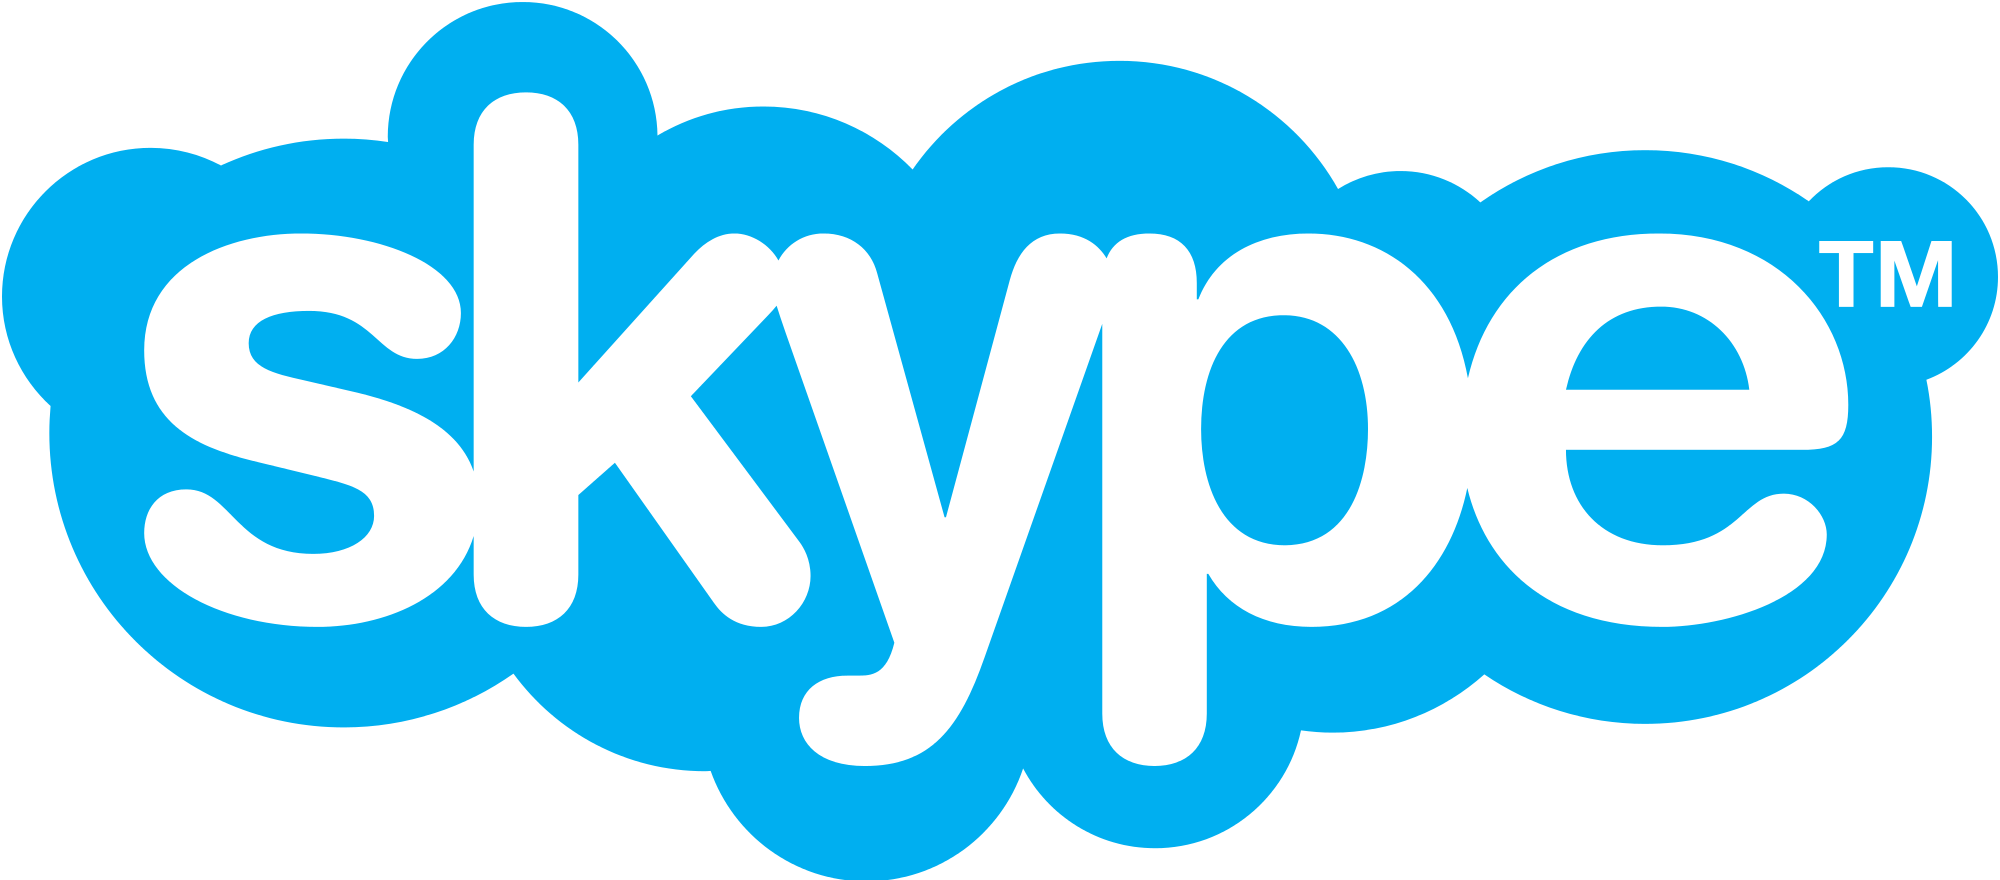 Skype_logo.svg